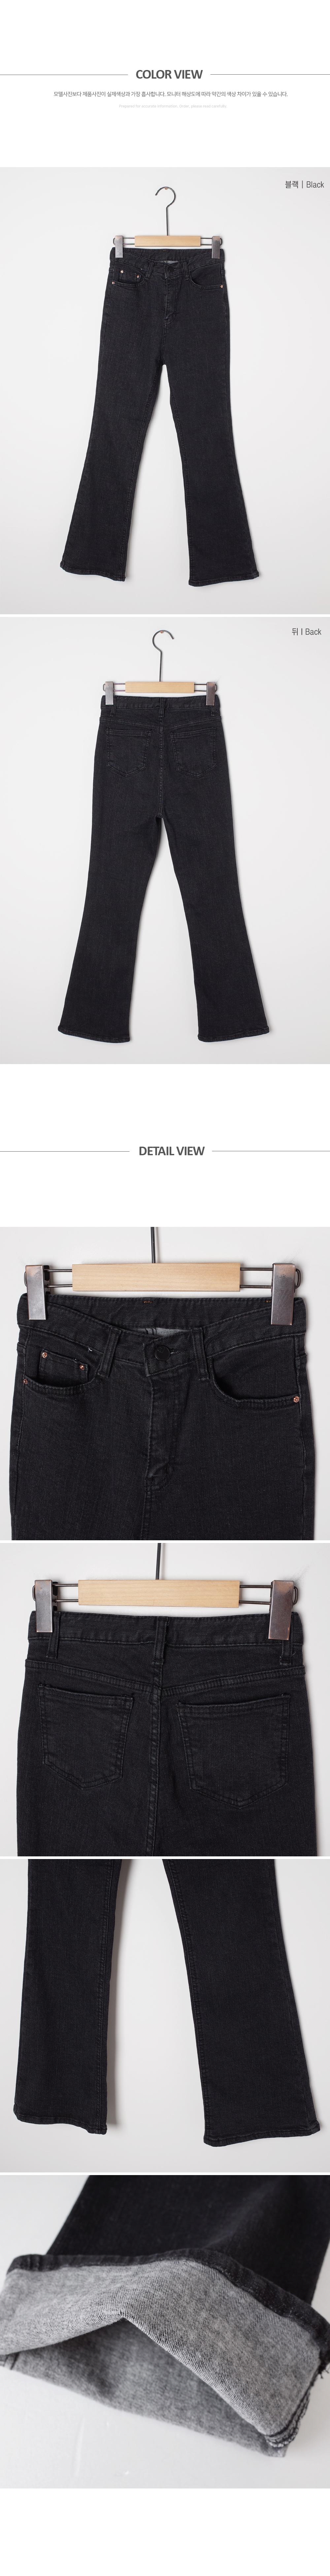 Bootcut line art pants